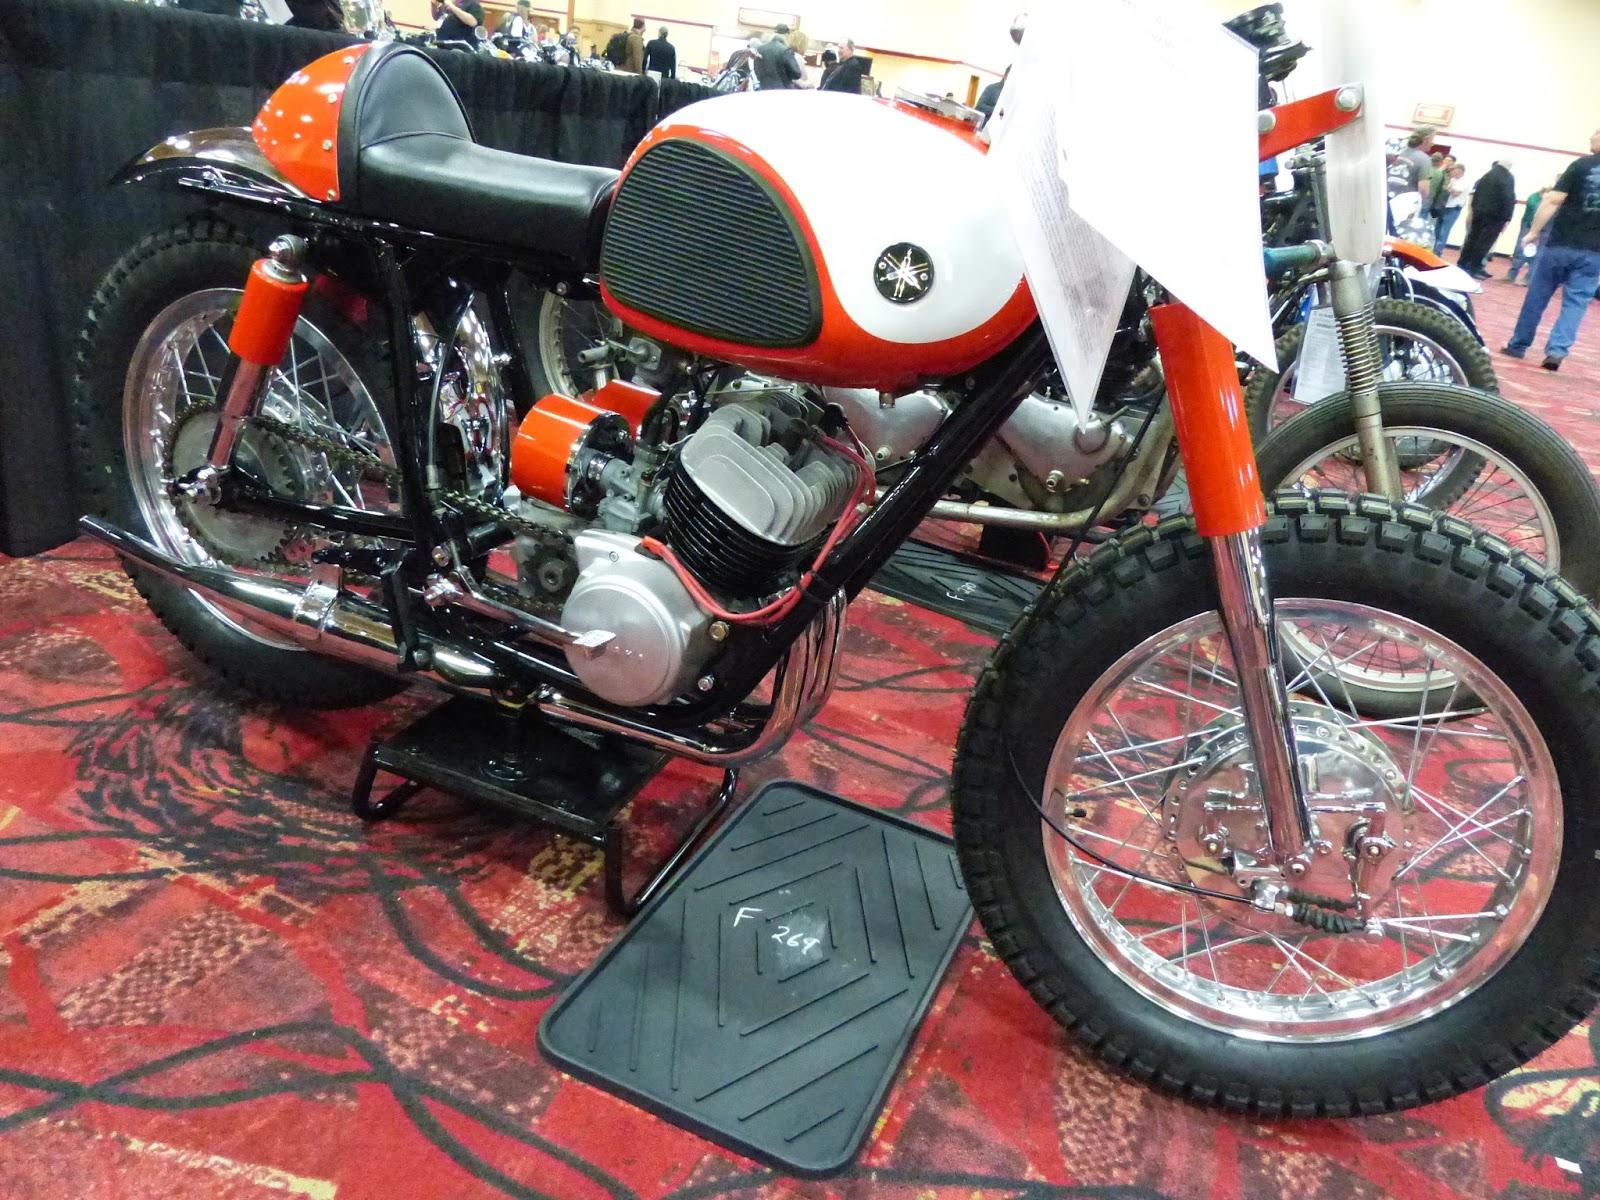 1965 yamaha ascot scrambler sold for 7 750 at the 2016 mecum las vegas motorcycle auction